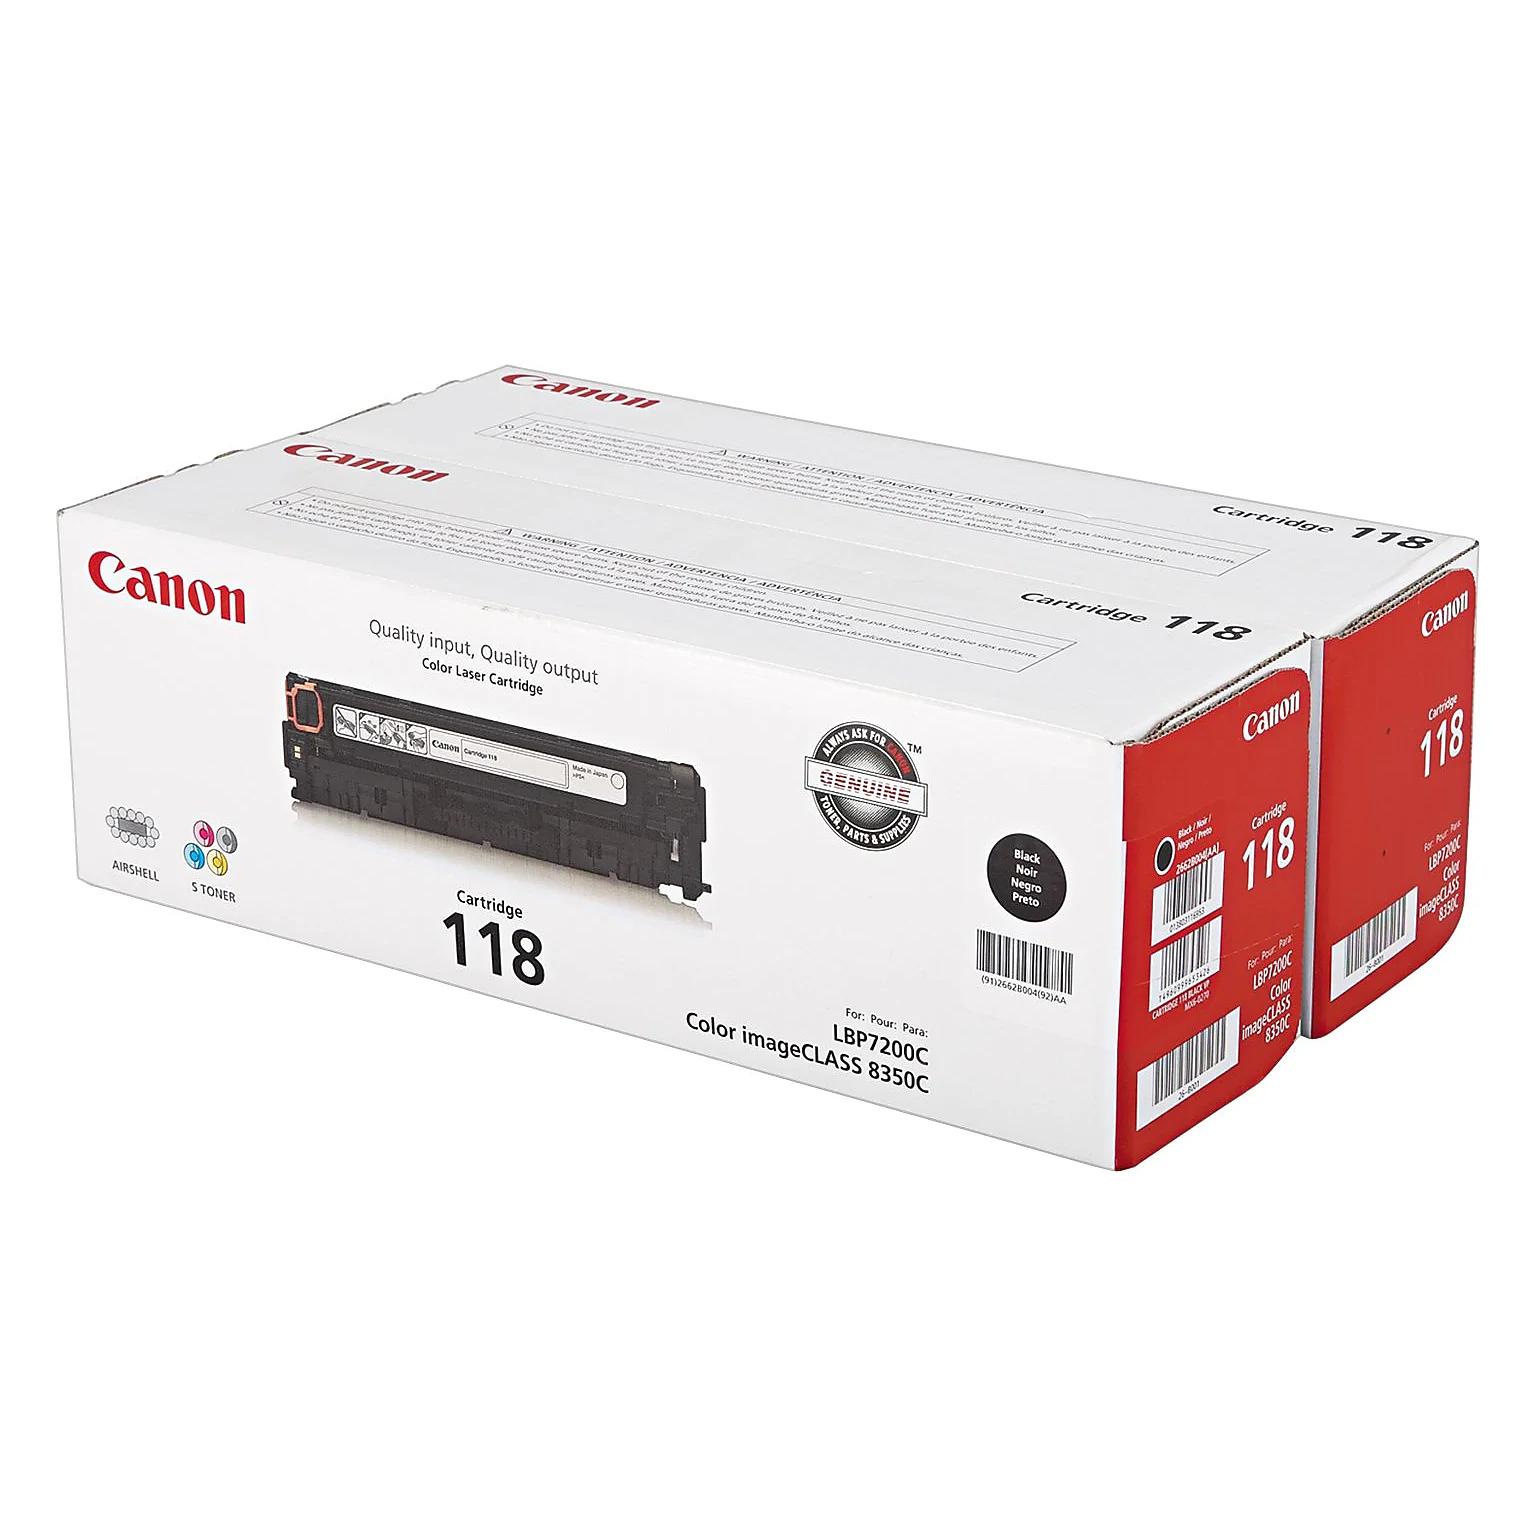 2662B004AA   Canon 118   Original Canon Laser Cartridge - Dual Pack - Black